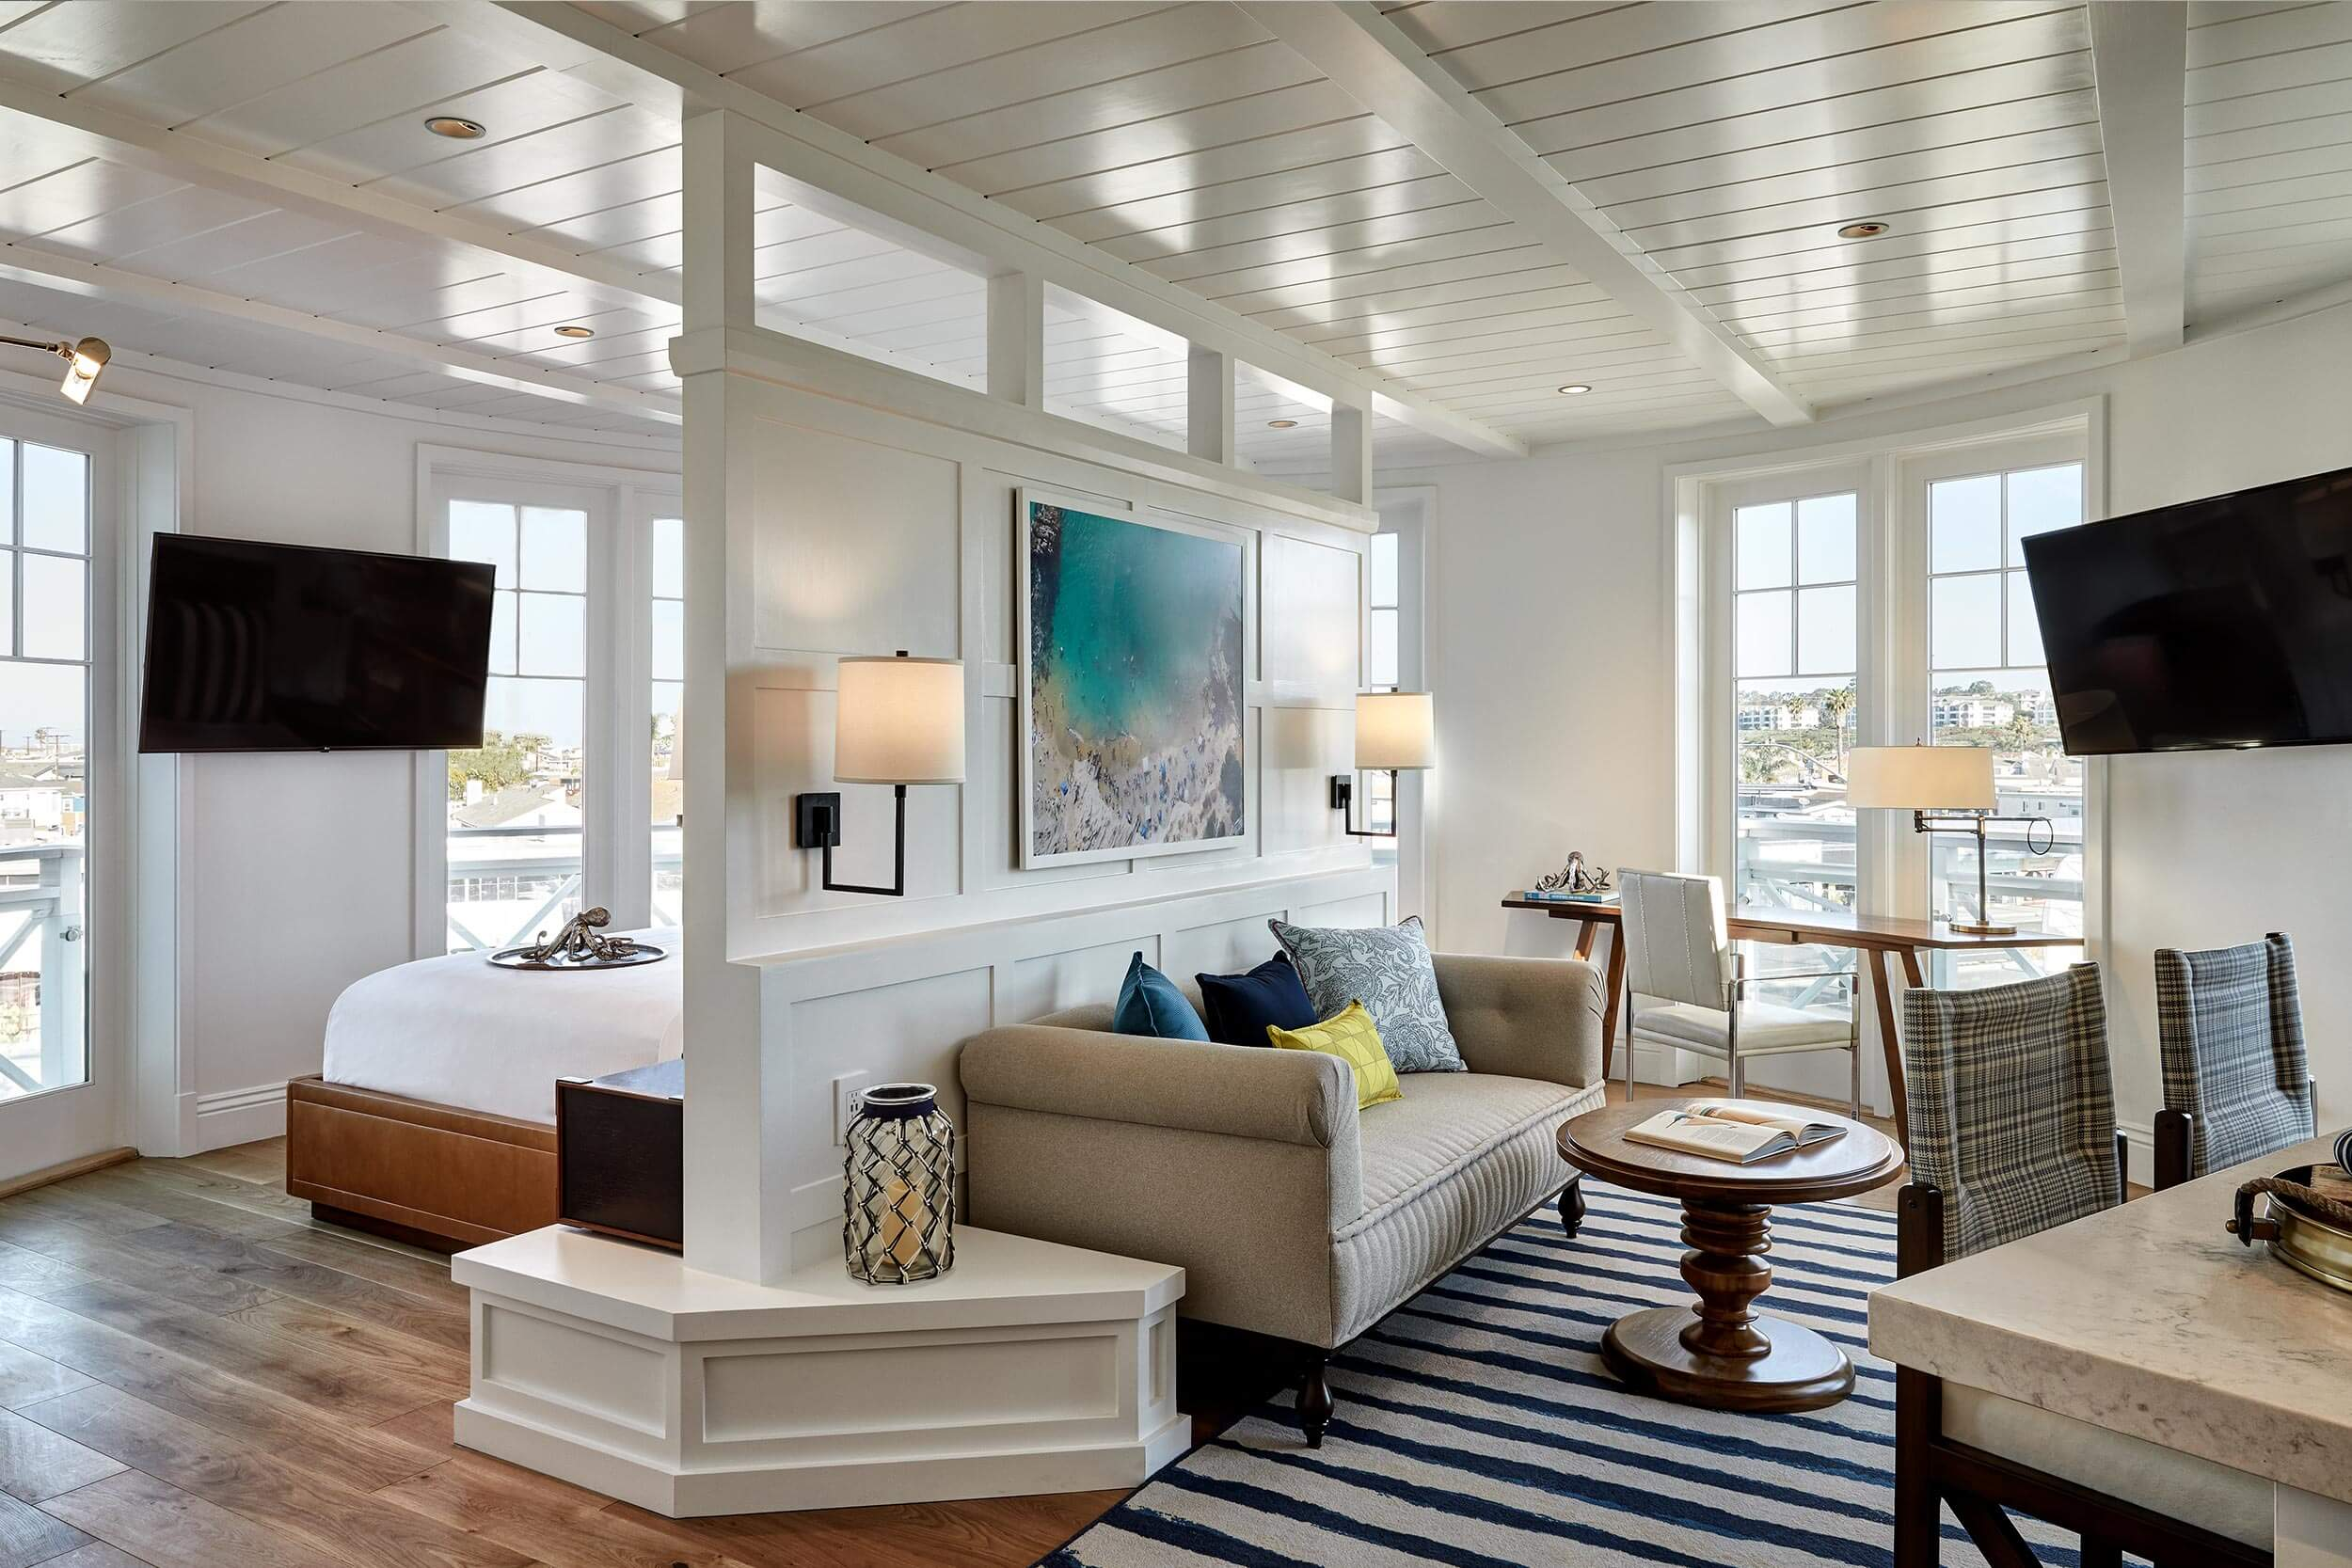 Rooms lido house newport beach for Hotel club decor